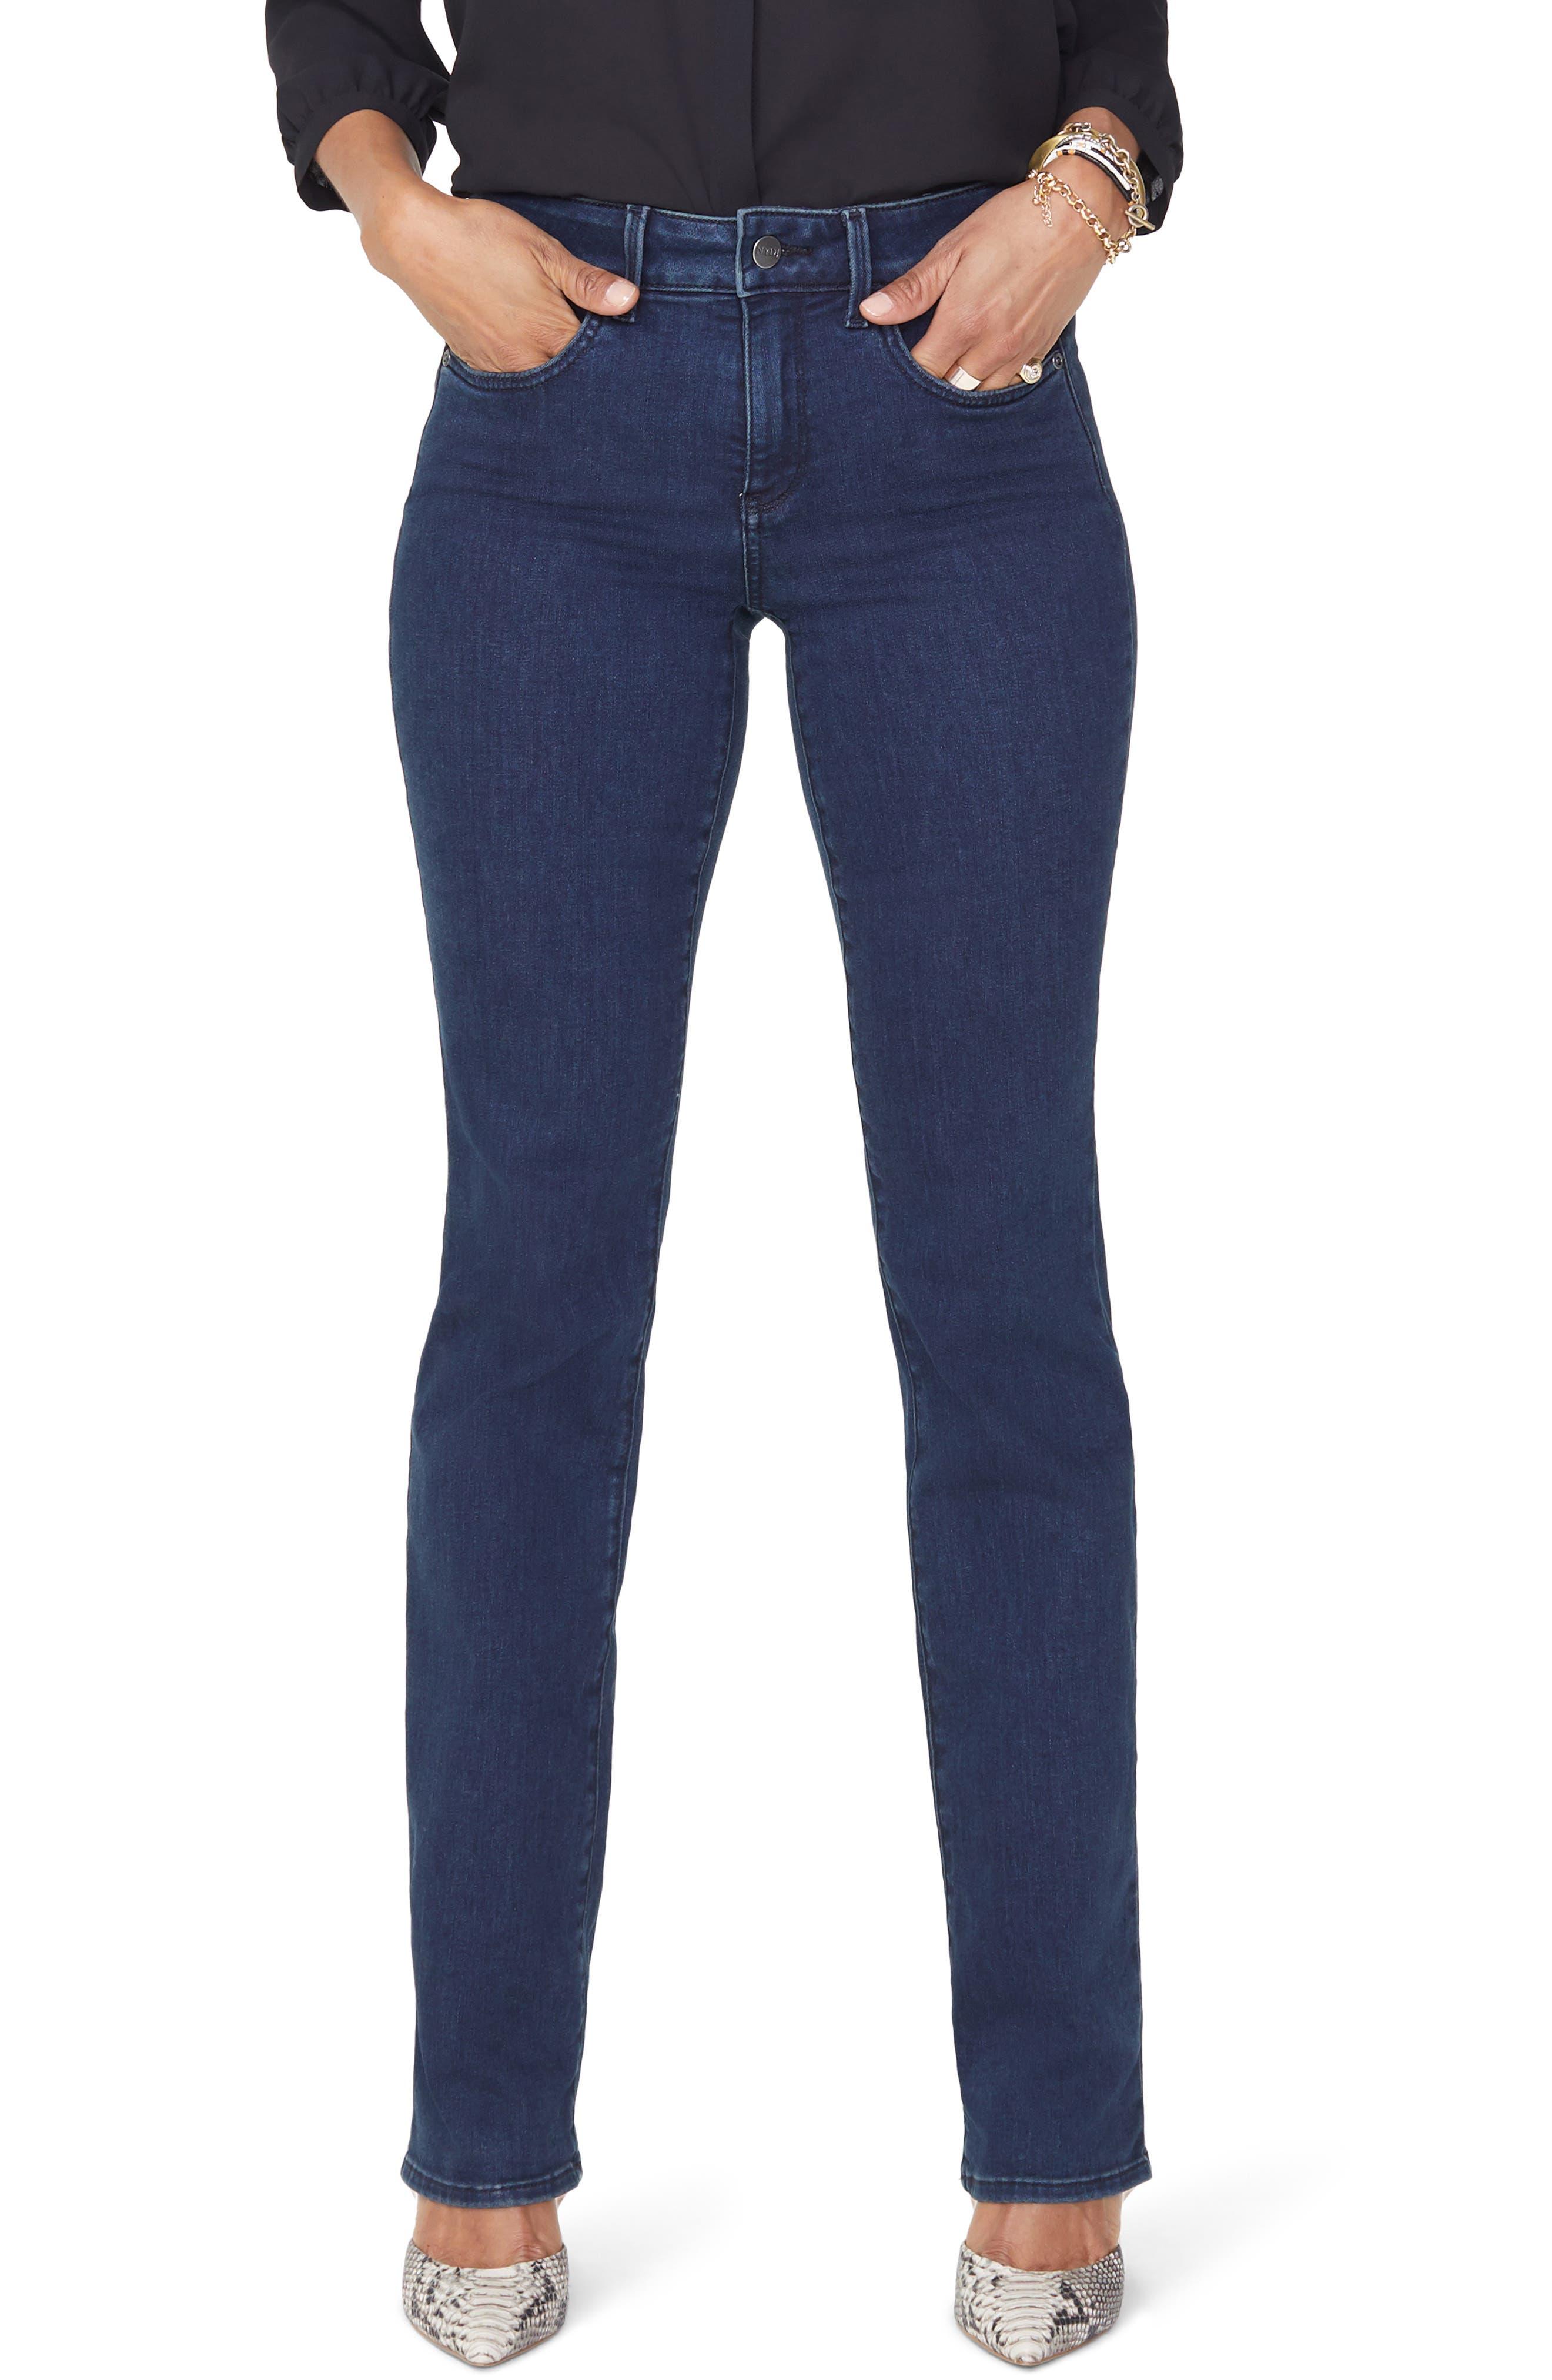 NYDJ, Marilyn Stretch Straight Leg Jeans, Main thumbnail 1, color, 405